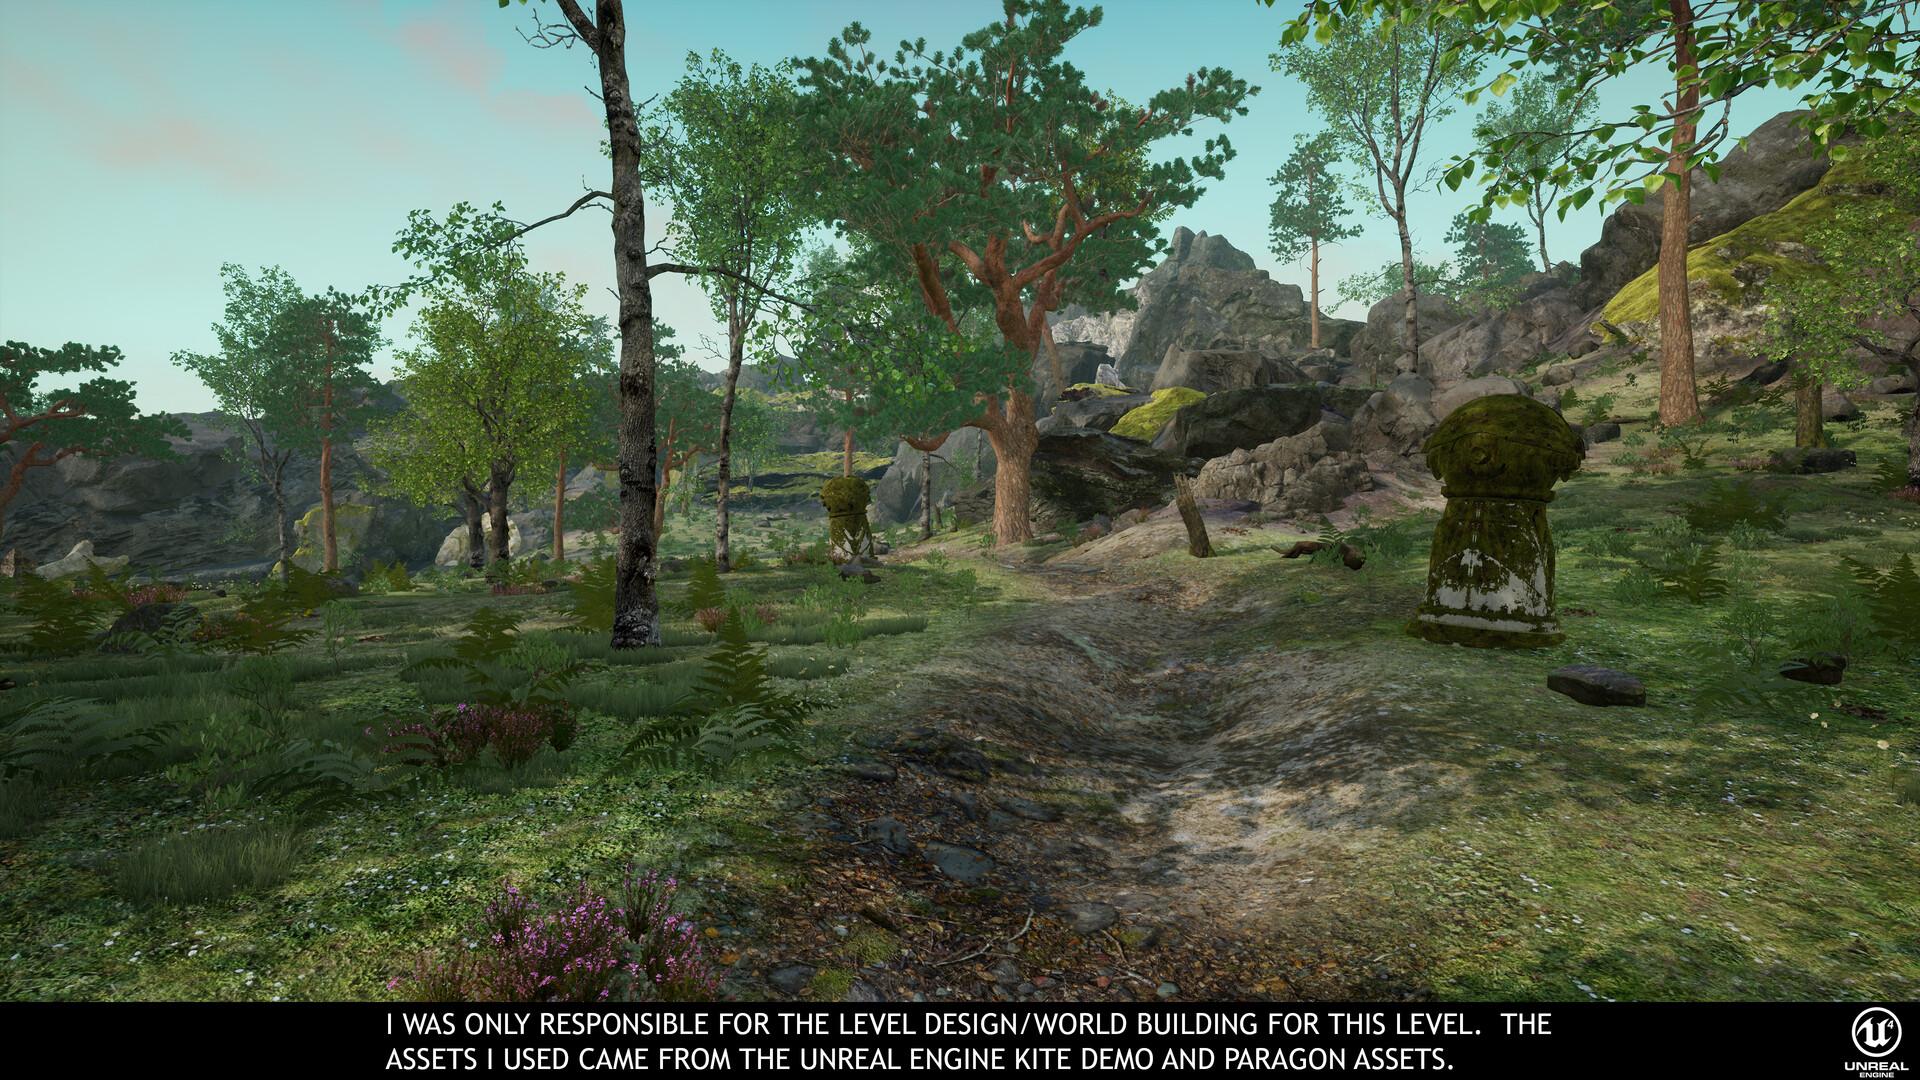 ArtStation - Unreal Engine Level Design/World Building Using